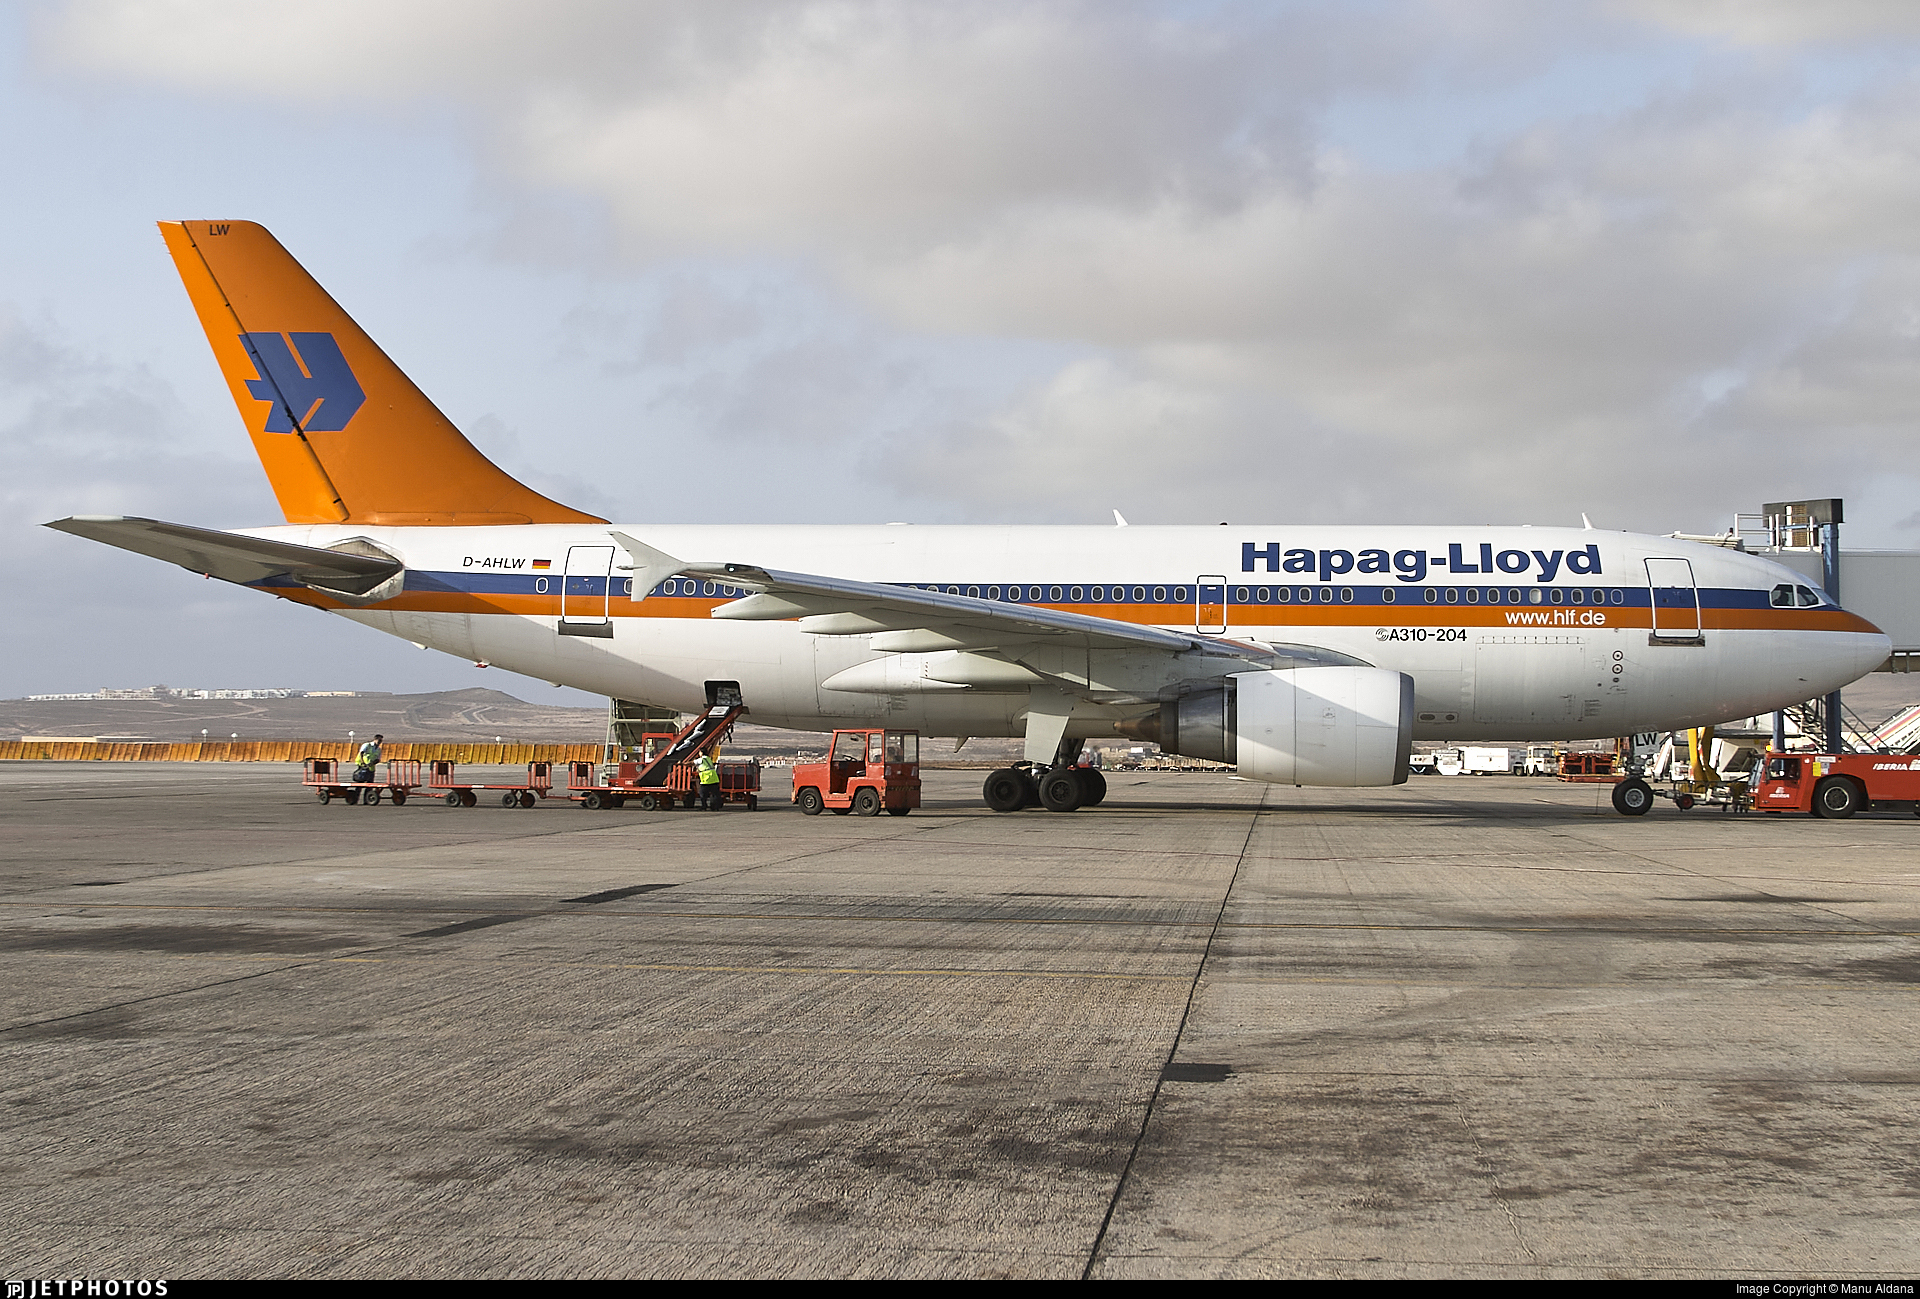 D-AHLW - Airbus A310-204 - Hapag-Lloyd